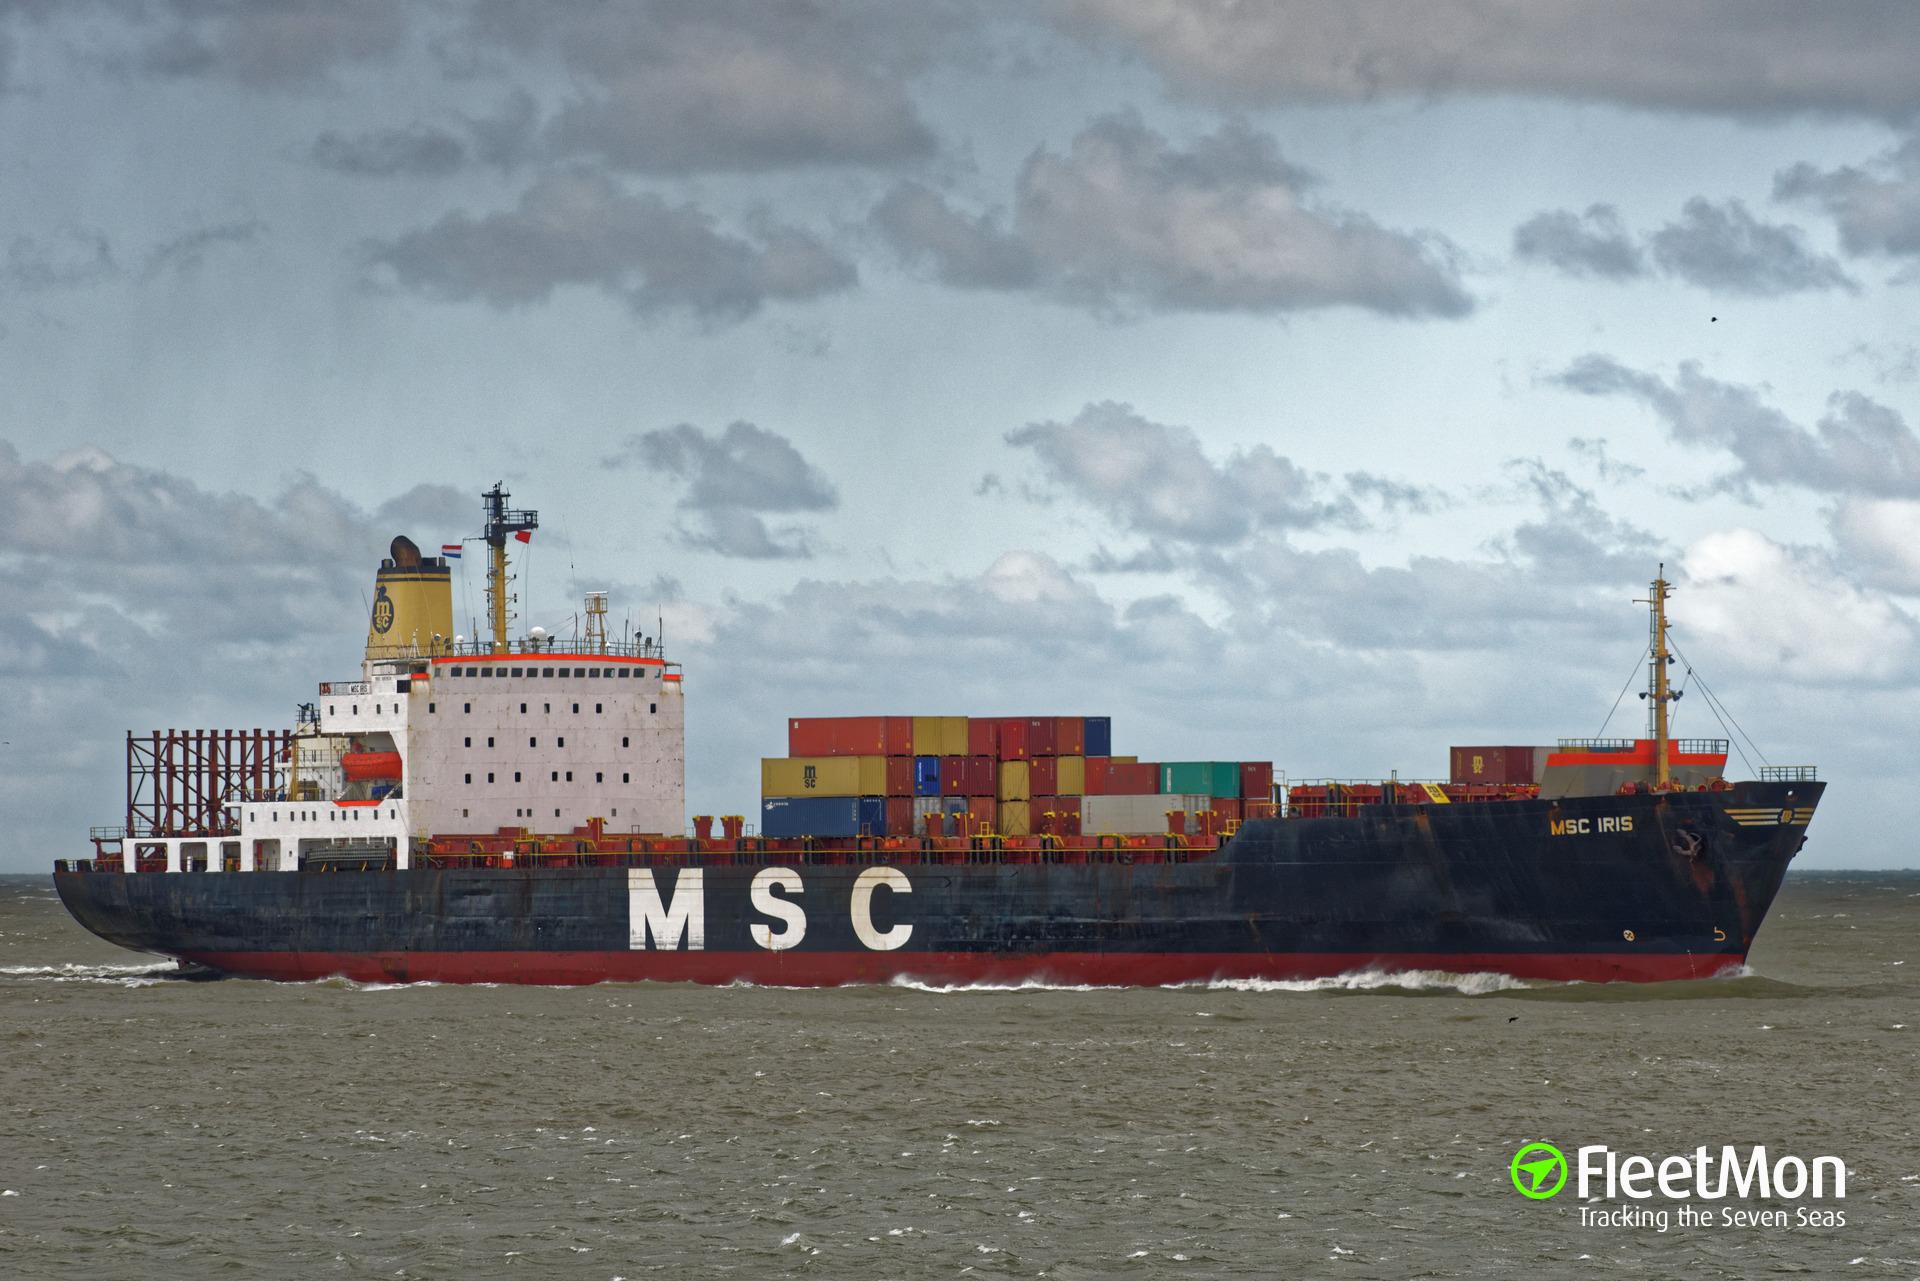 MSC IRIS troubled twice?